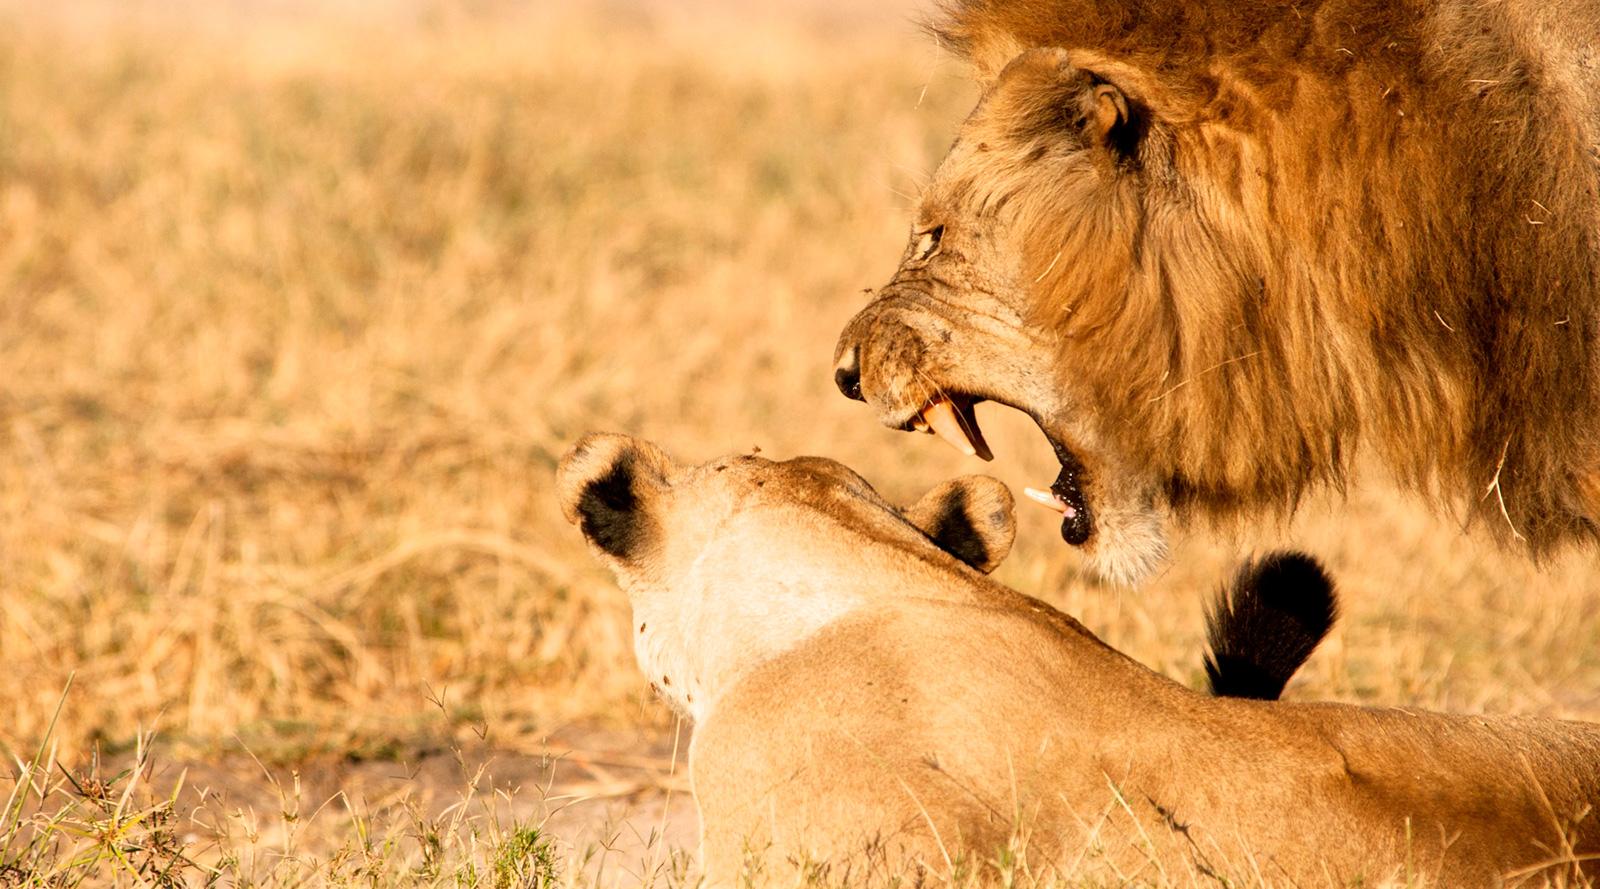 © Pietro Luraschi | Tanzania